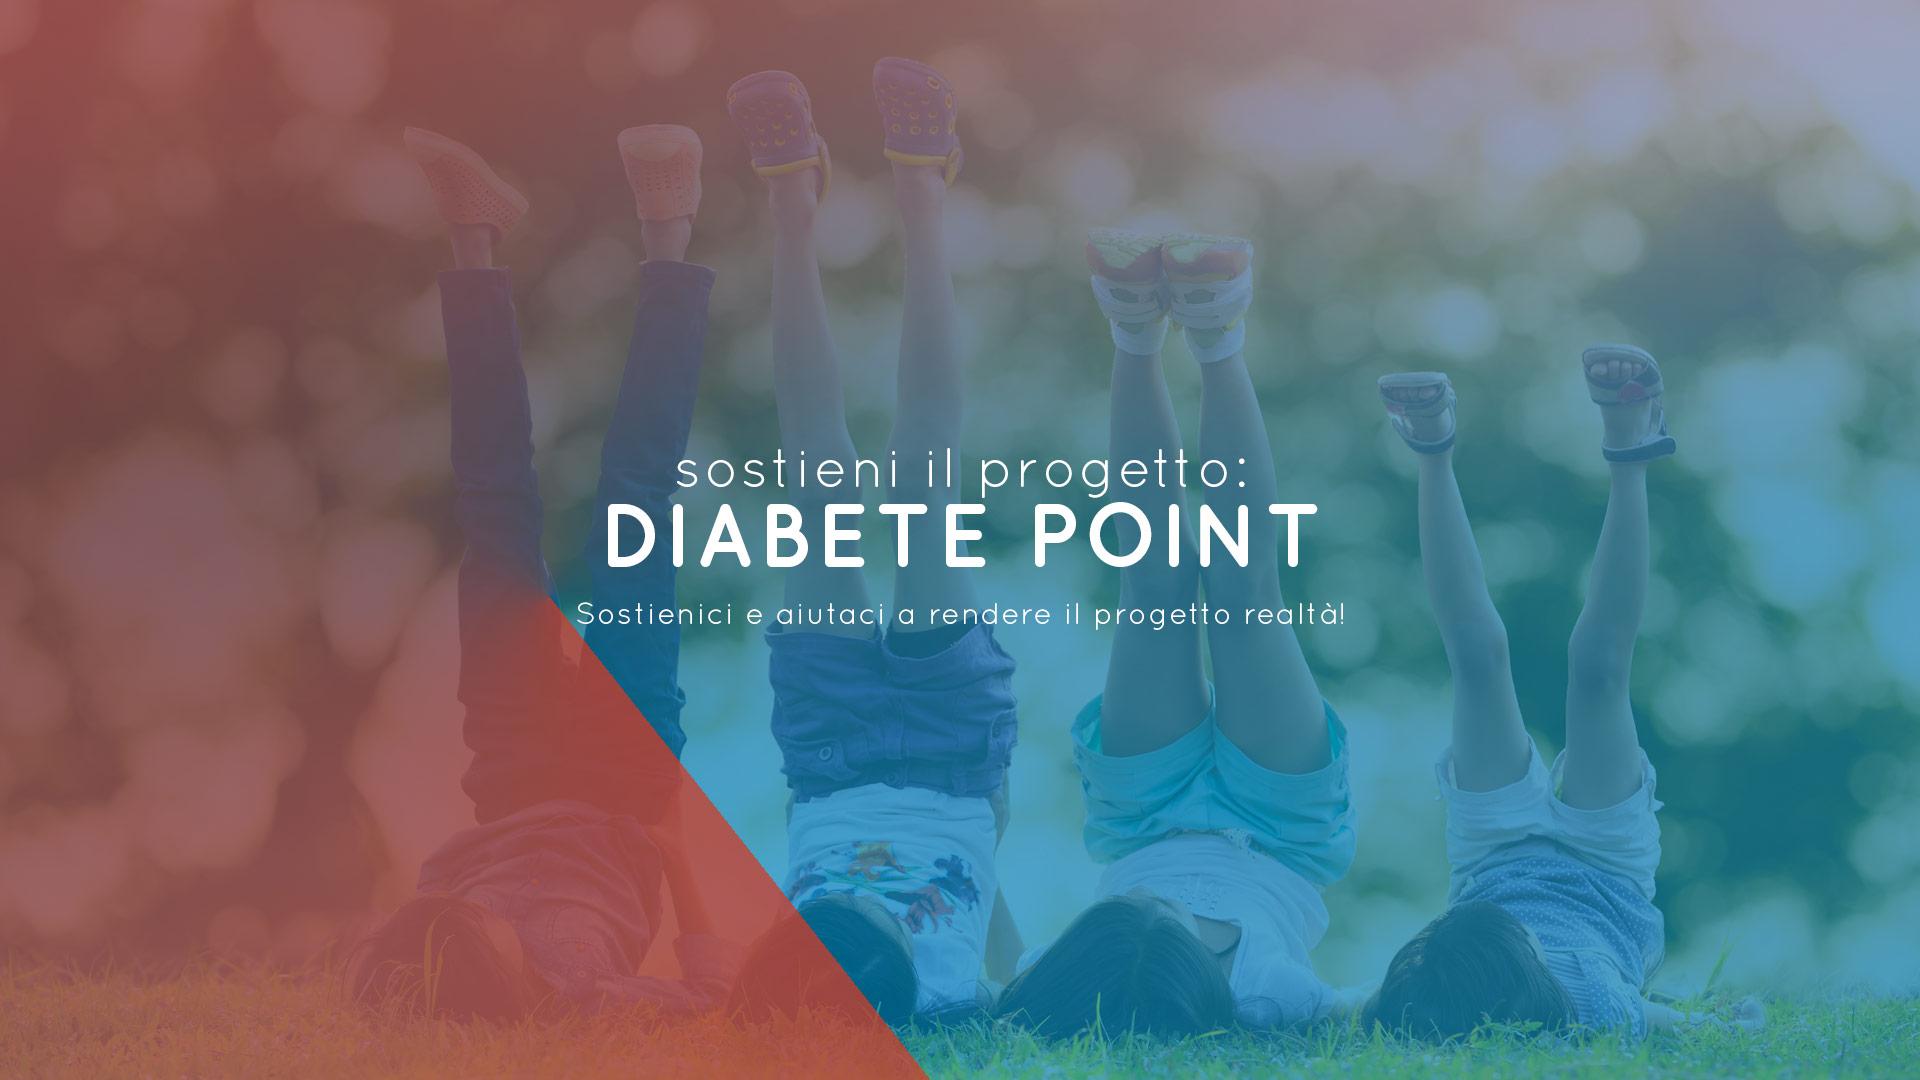 Diabete Point